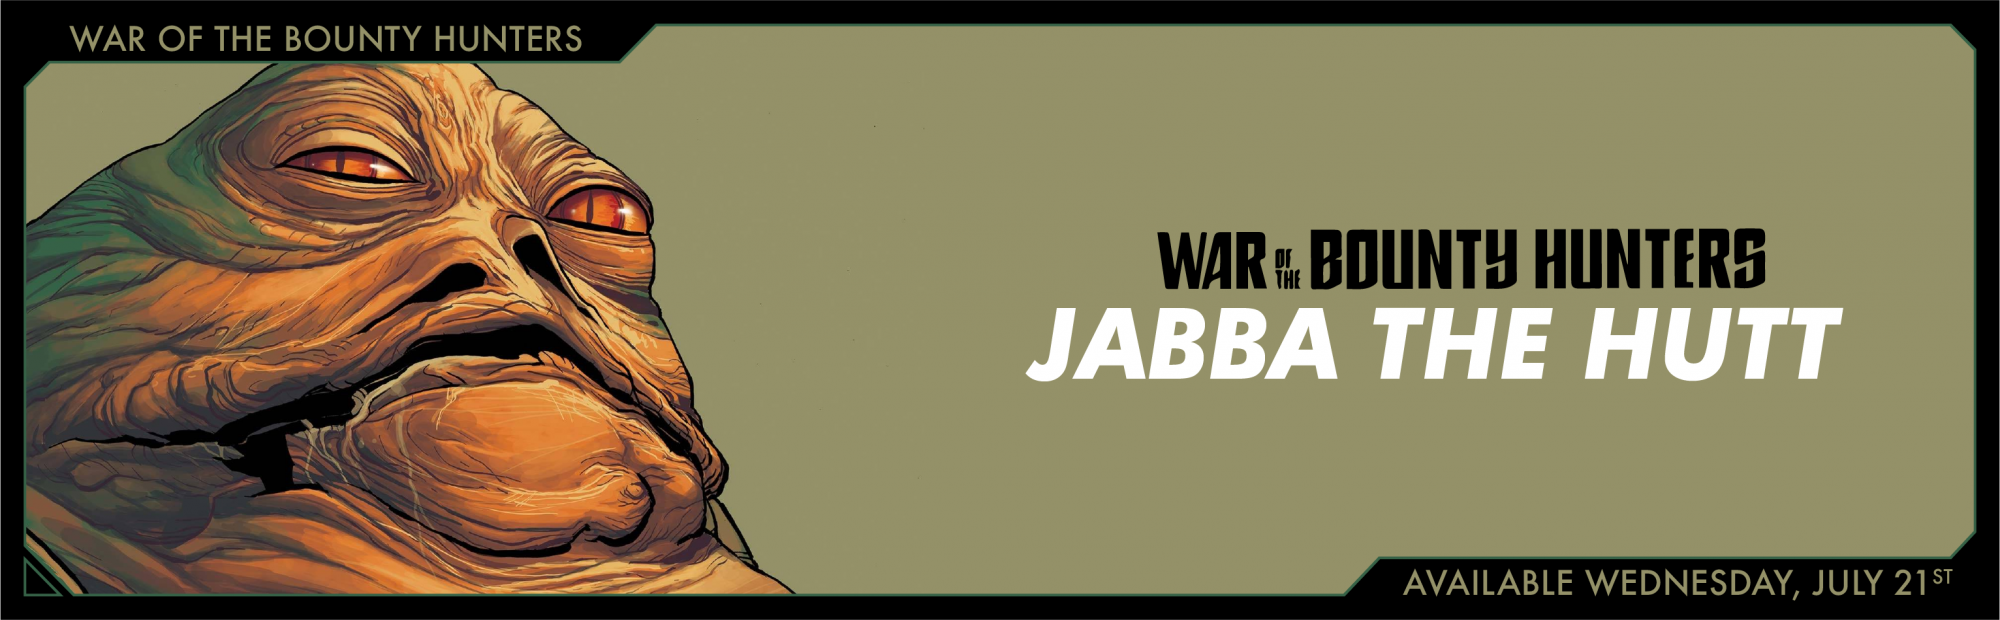 Star Wars War of the Bounty Hunters Jabba the Hut #1